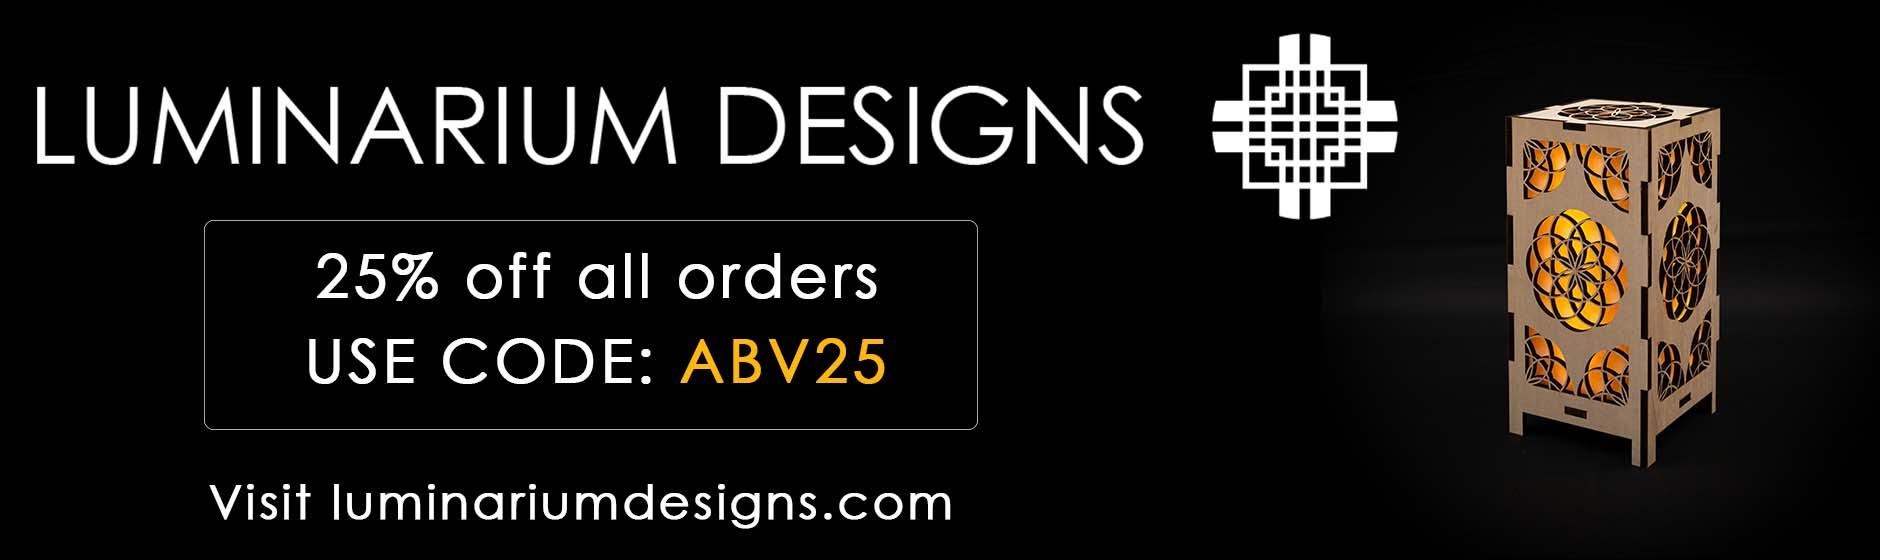 https://luminariumdesigns.com 25% off offer code ABV25